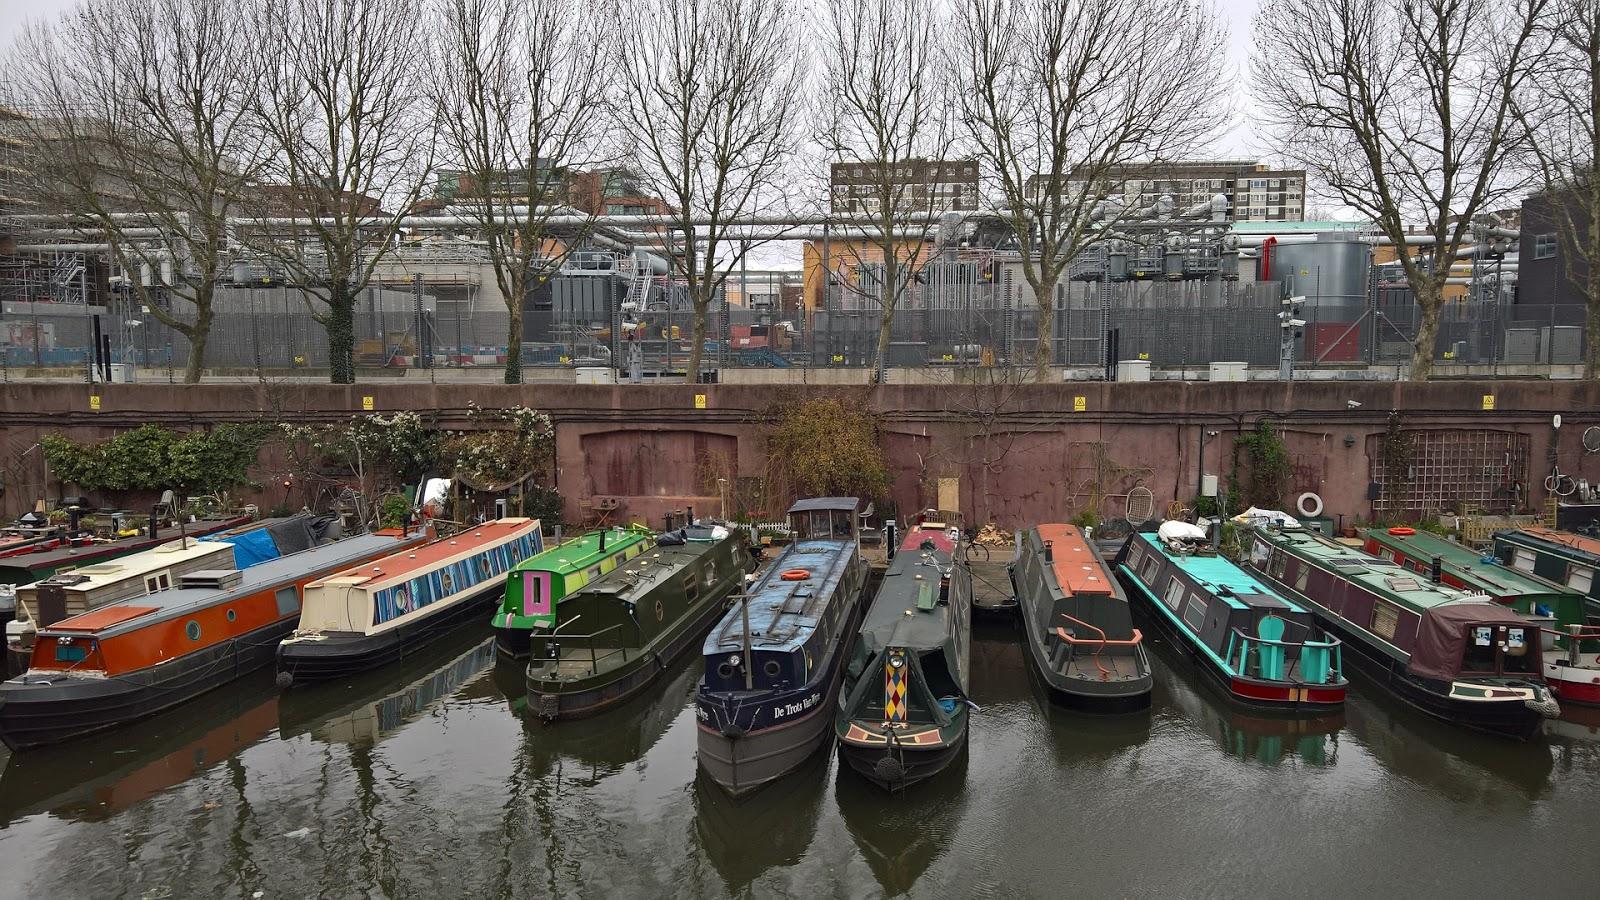 GJW Blog - Narrowboat running costs